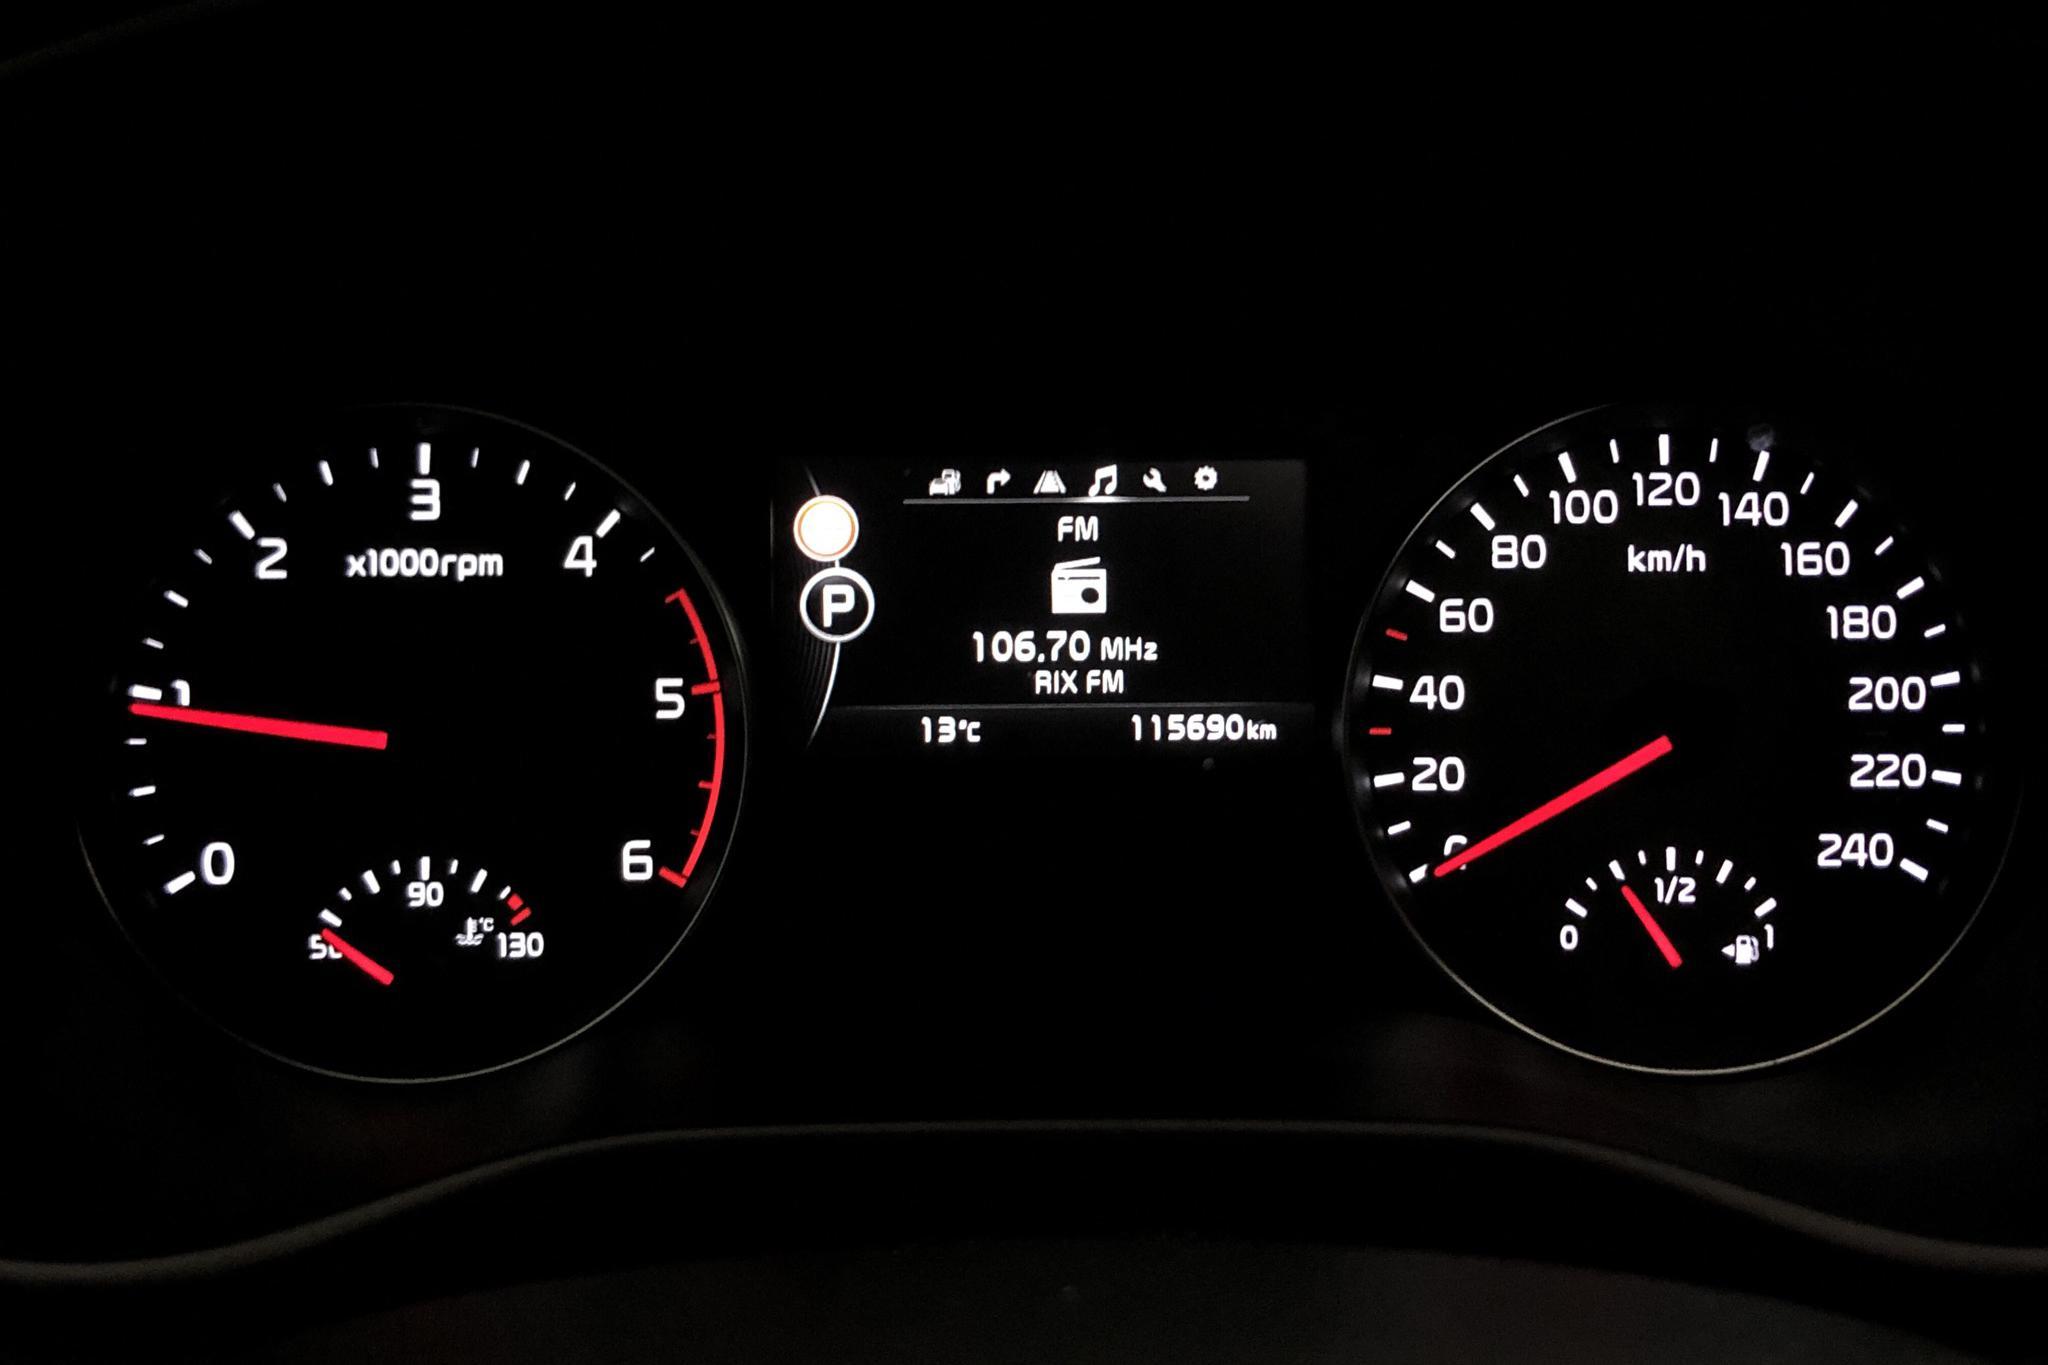 KIA Sportage 2.0 CRDi AWD (184hk) - 11 569 mil - Automat - röd - 2016